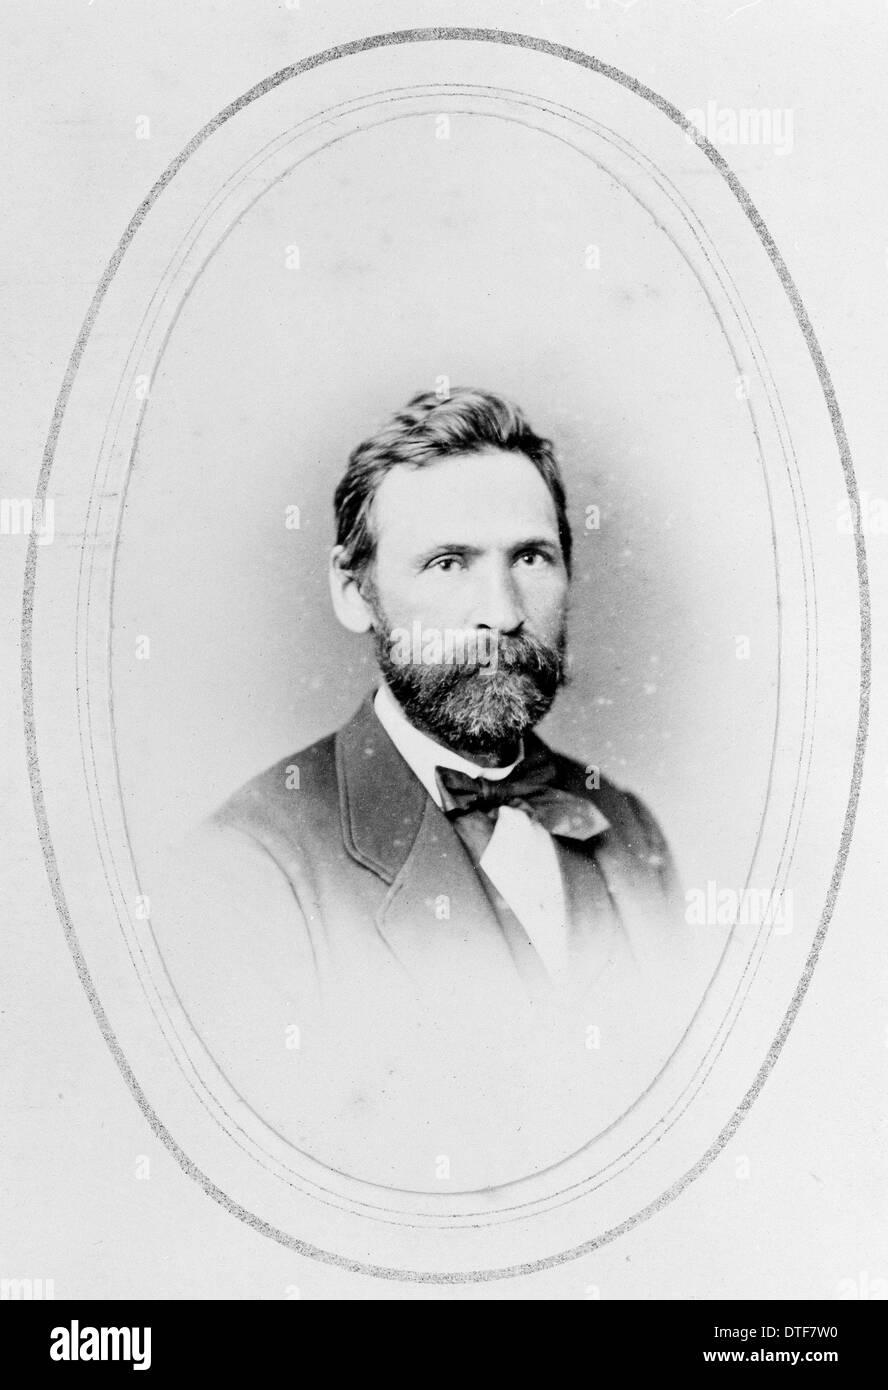 Auguste Francois Marie Glaziou (1828-1906) - Stock Image